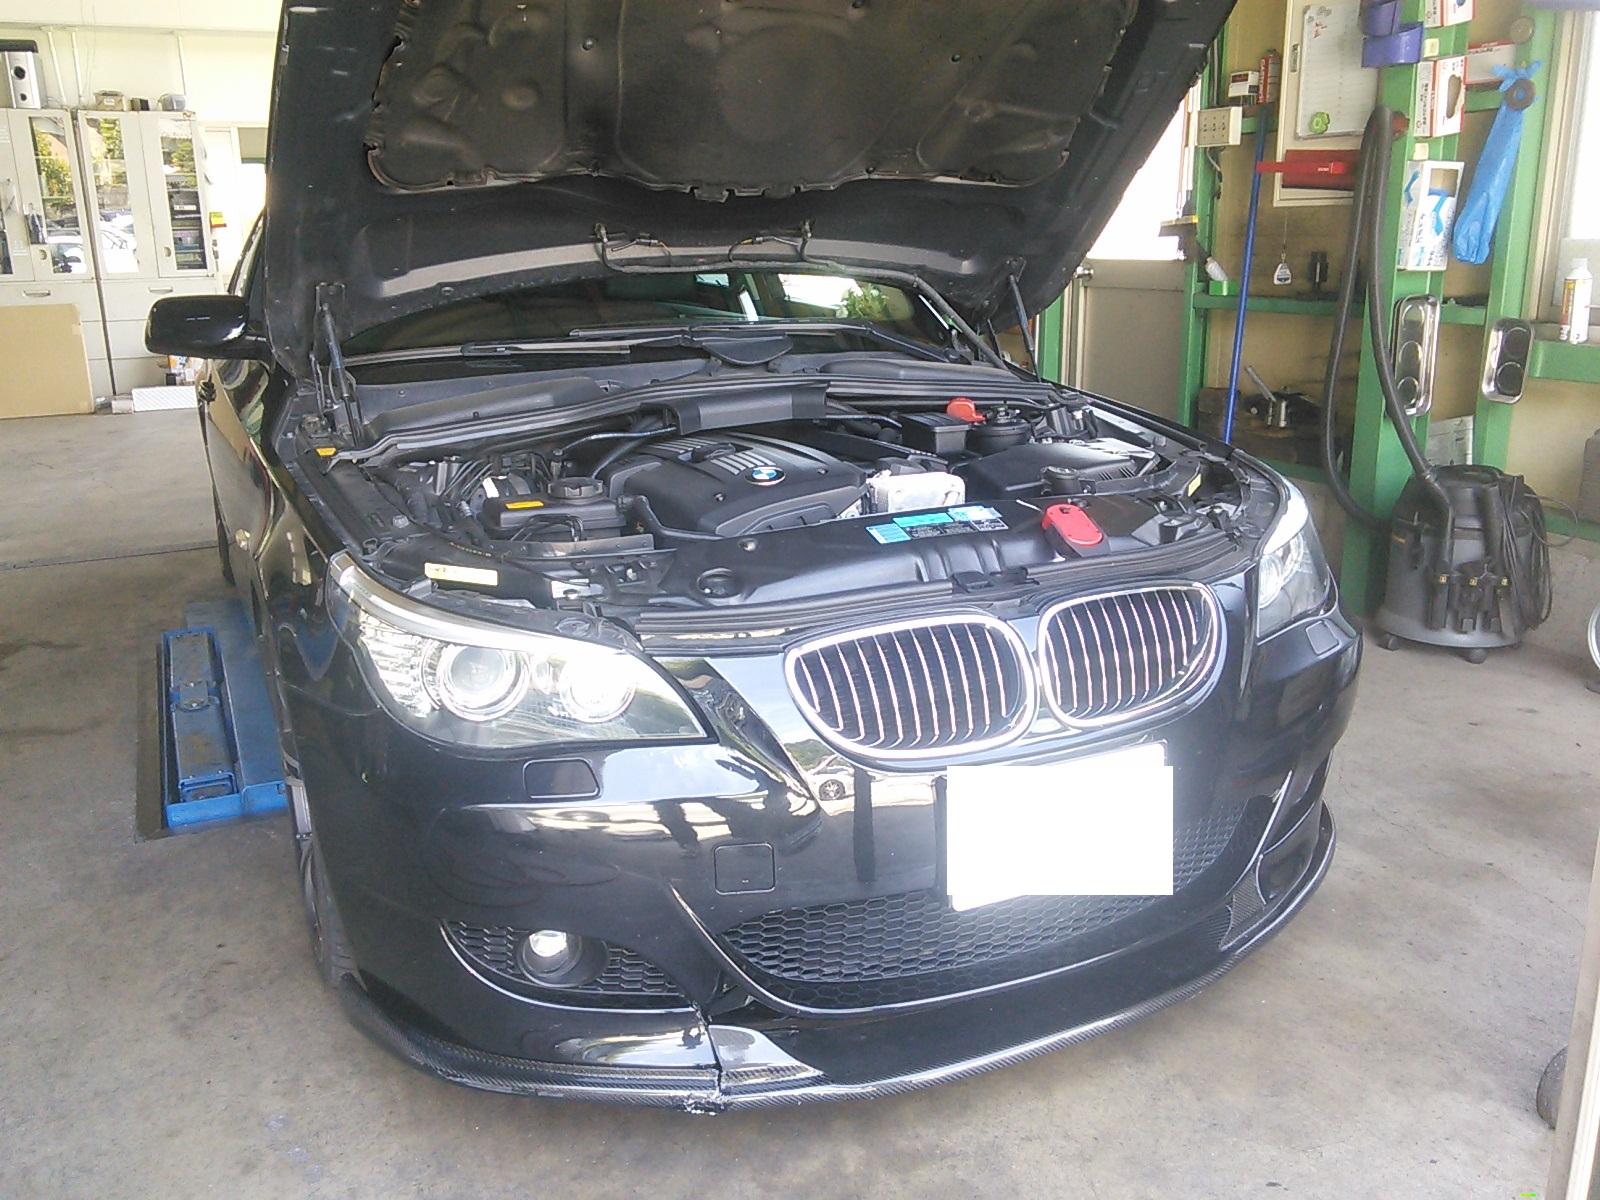 BMW オートマチック不調 ATトラブルはいろんなケースがあります